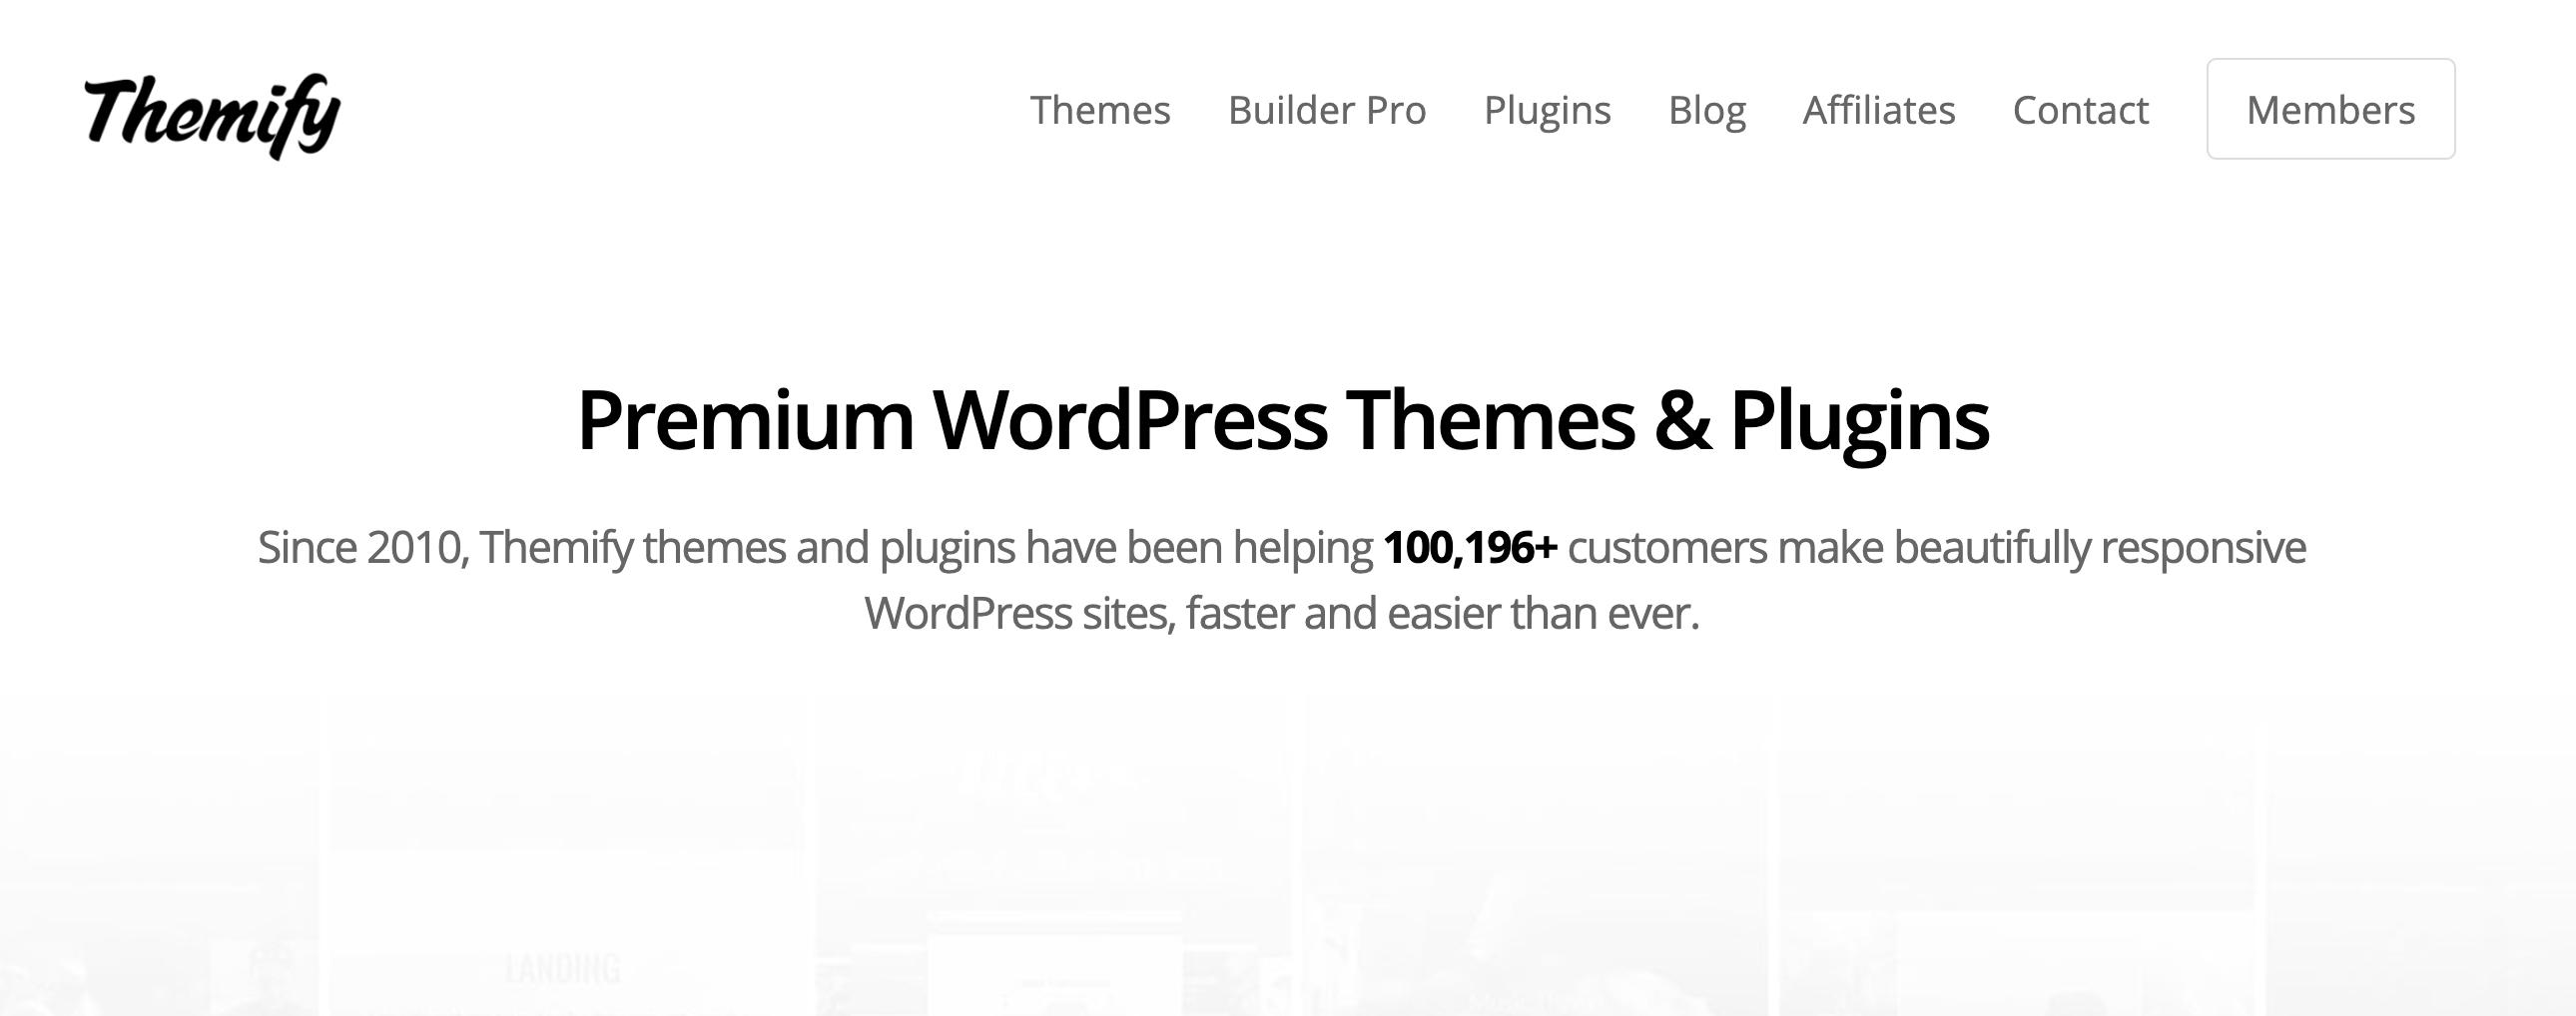 Themify Premium WordPress Themes & Plugins